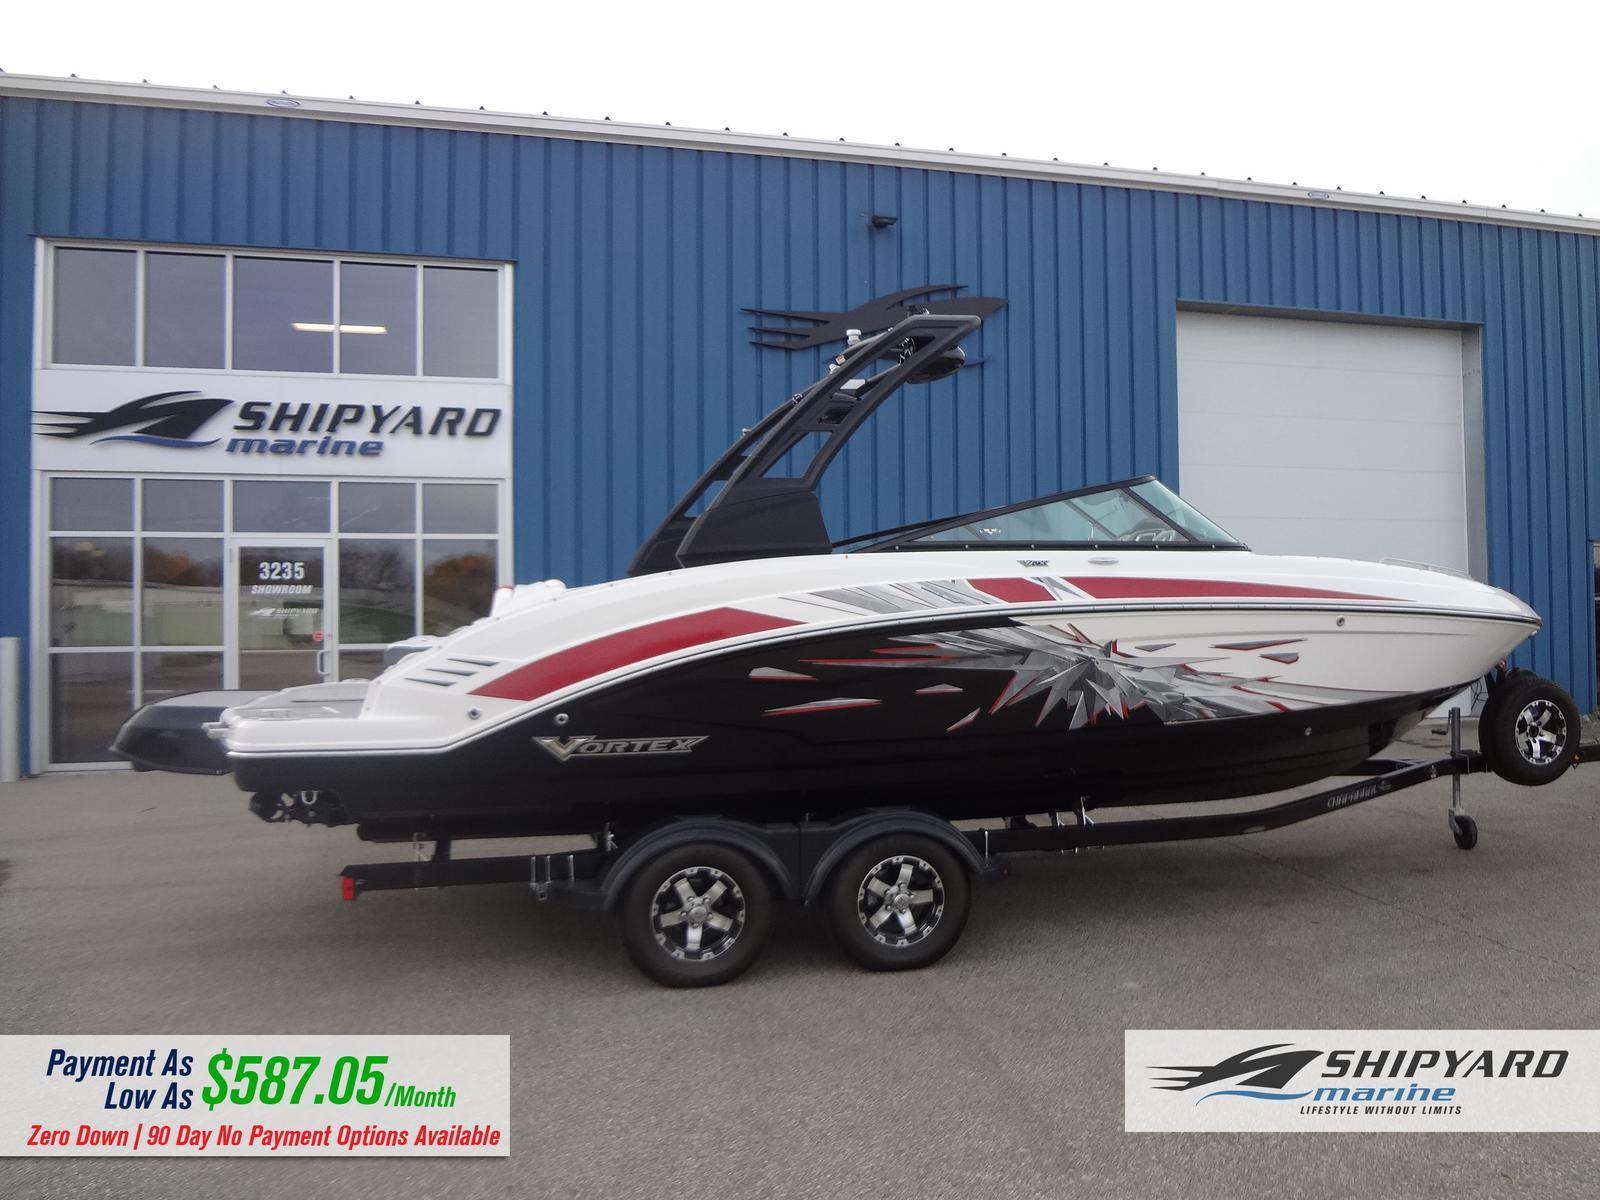 2019 Vortex Boats 2430 VRX Surf Edition